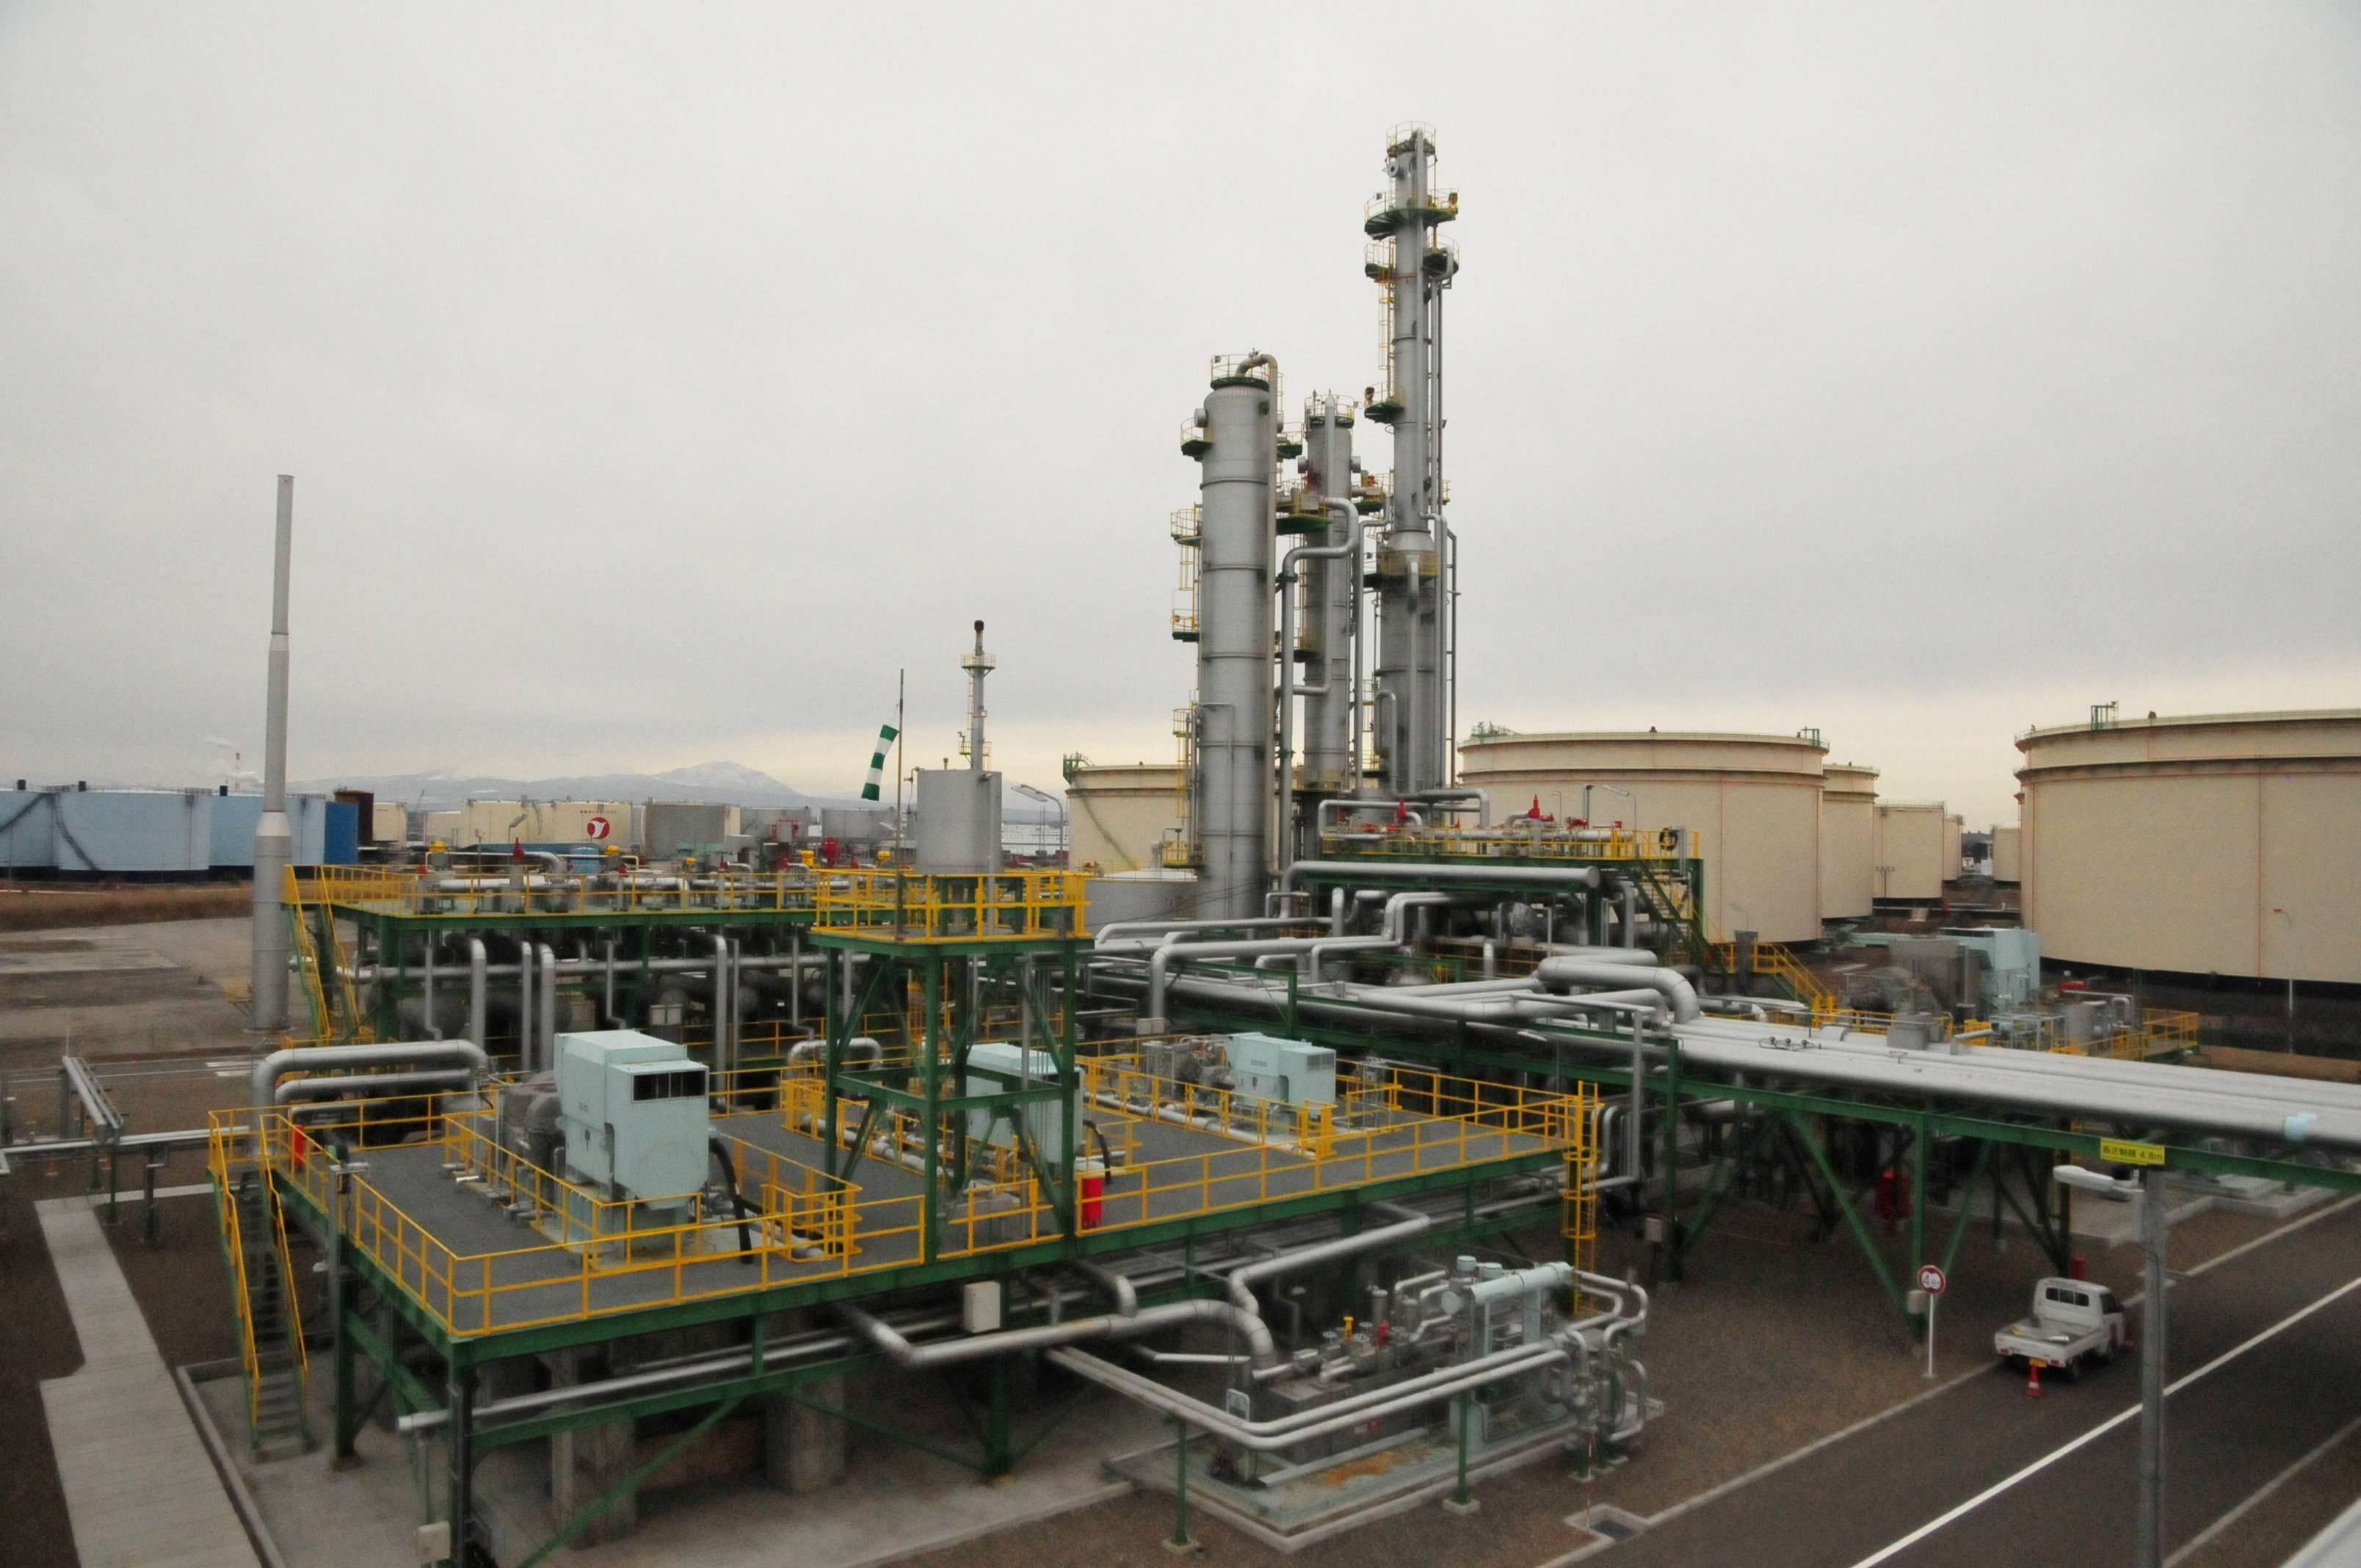 Carbon dioxide environment energy emissions